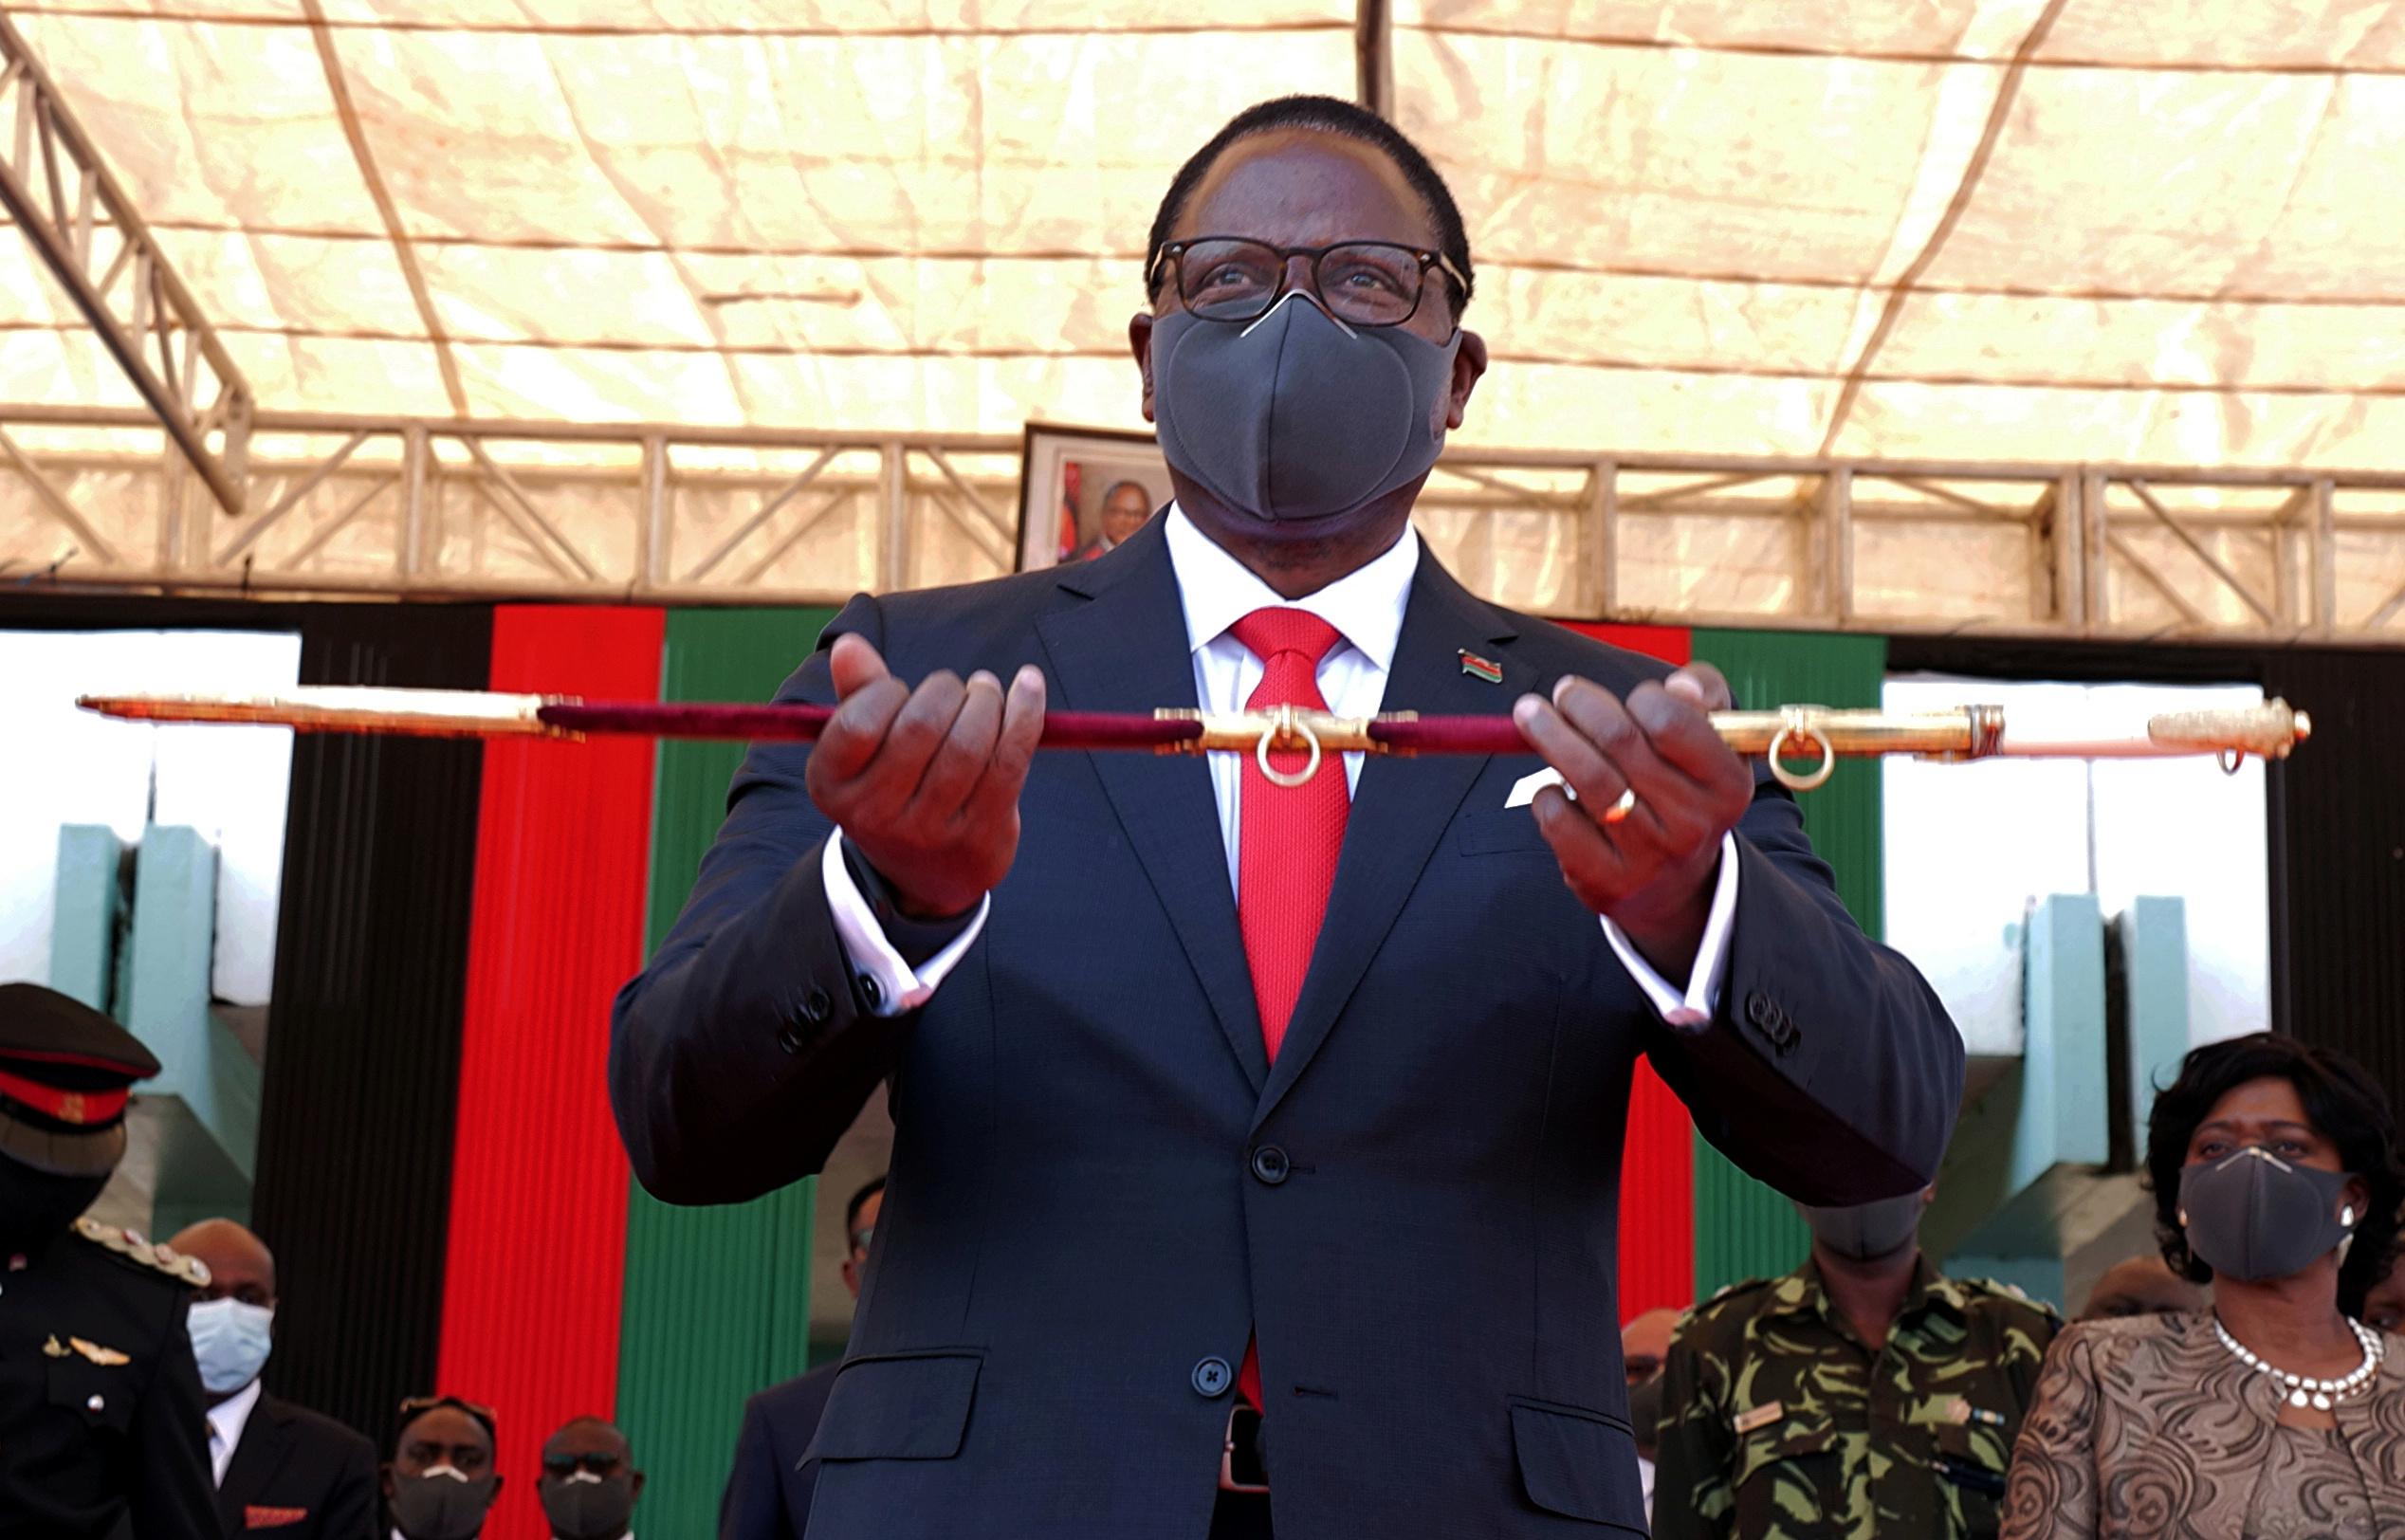 Malawi's President Lazarus Chakwera is sworn in in Lilongwe, Malawi, July 6, 2020. REUTERS/Eldson Chagara